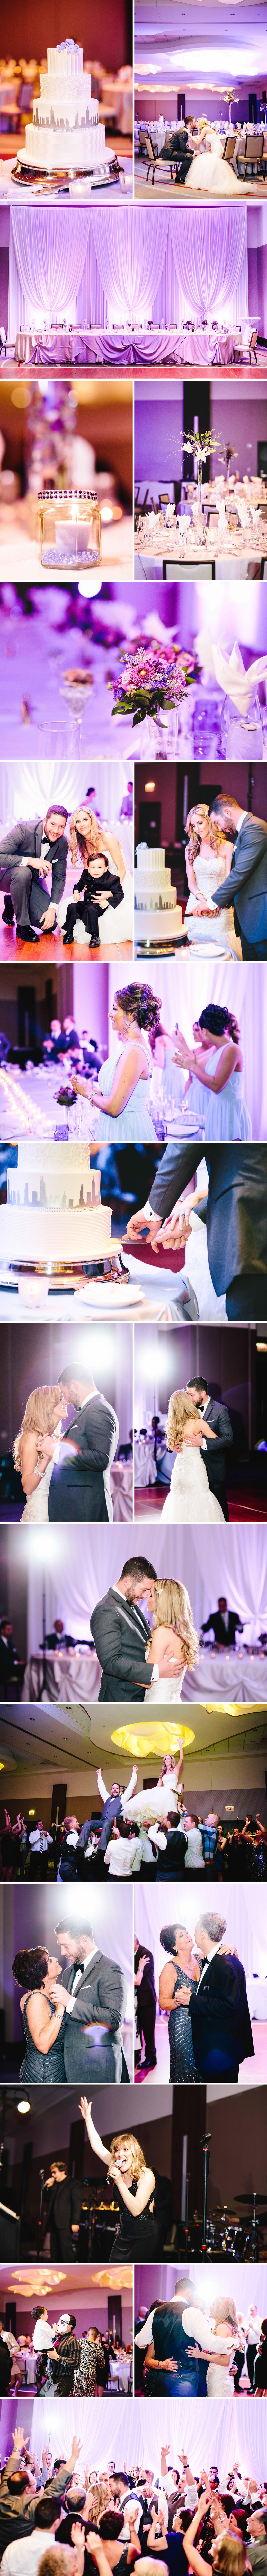 chicago-fine-art-wedding-photography-gorsky7